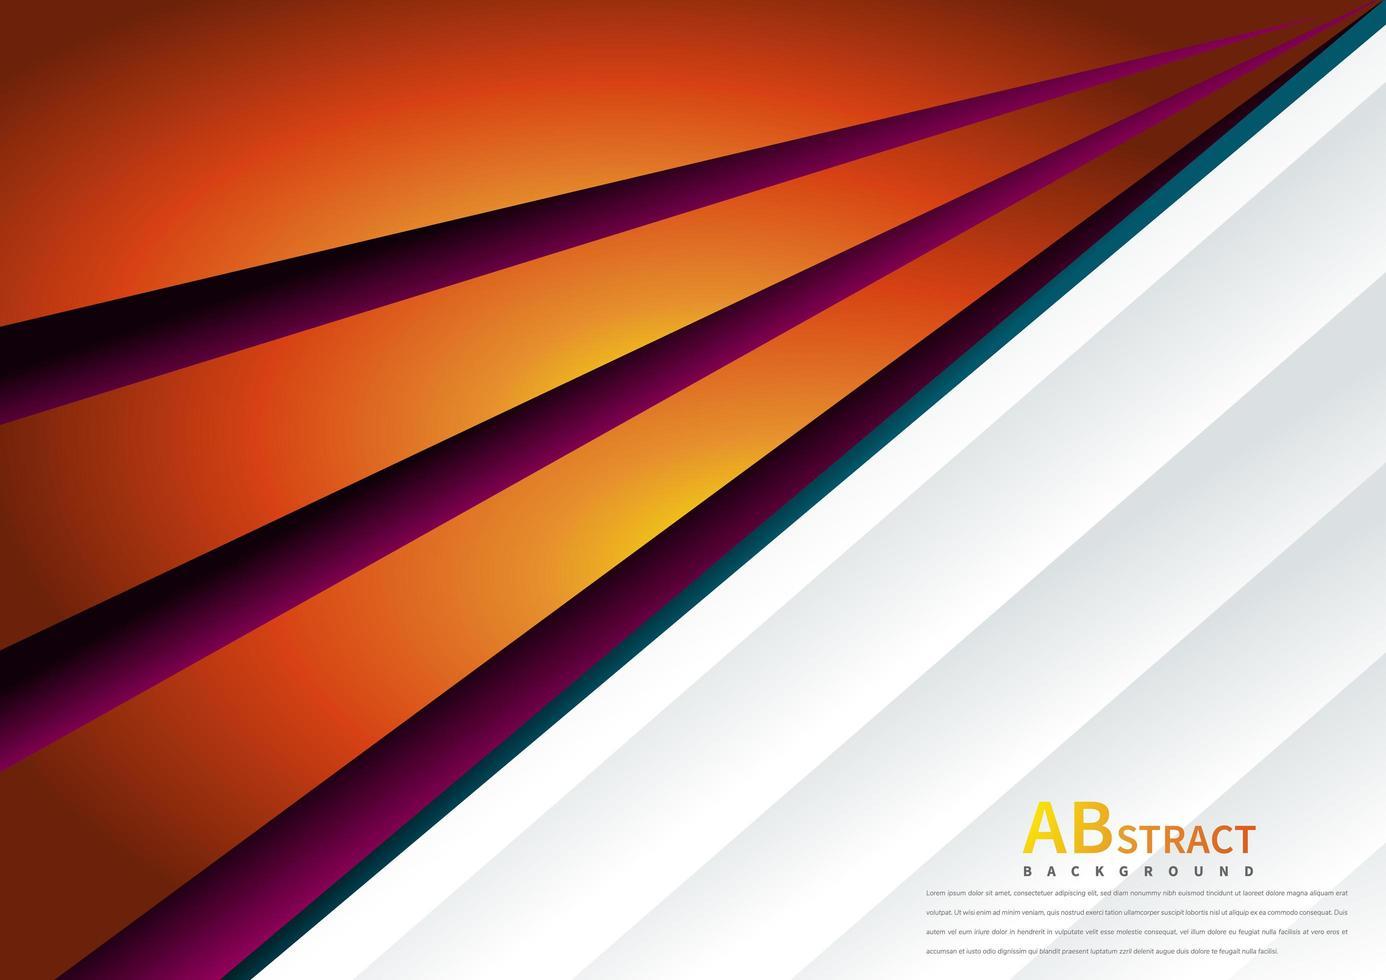 orange och lila vinklad brastbakgrund vektor